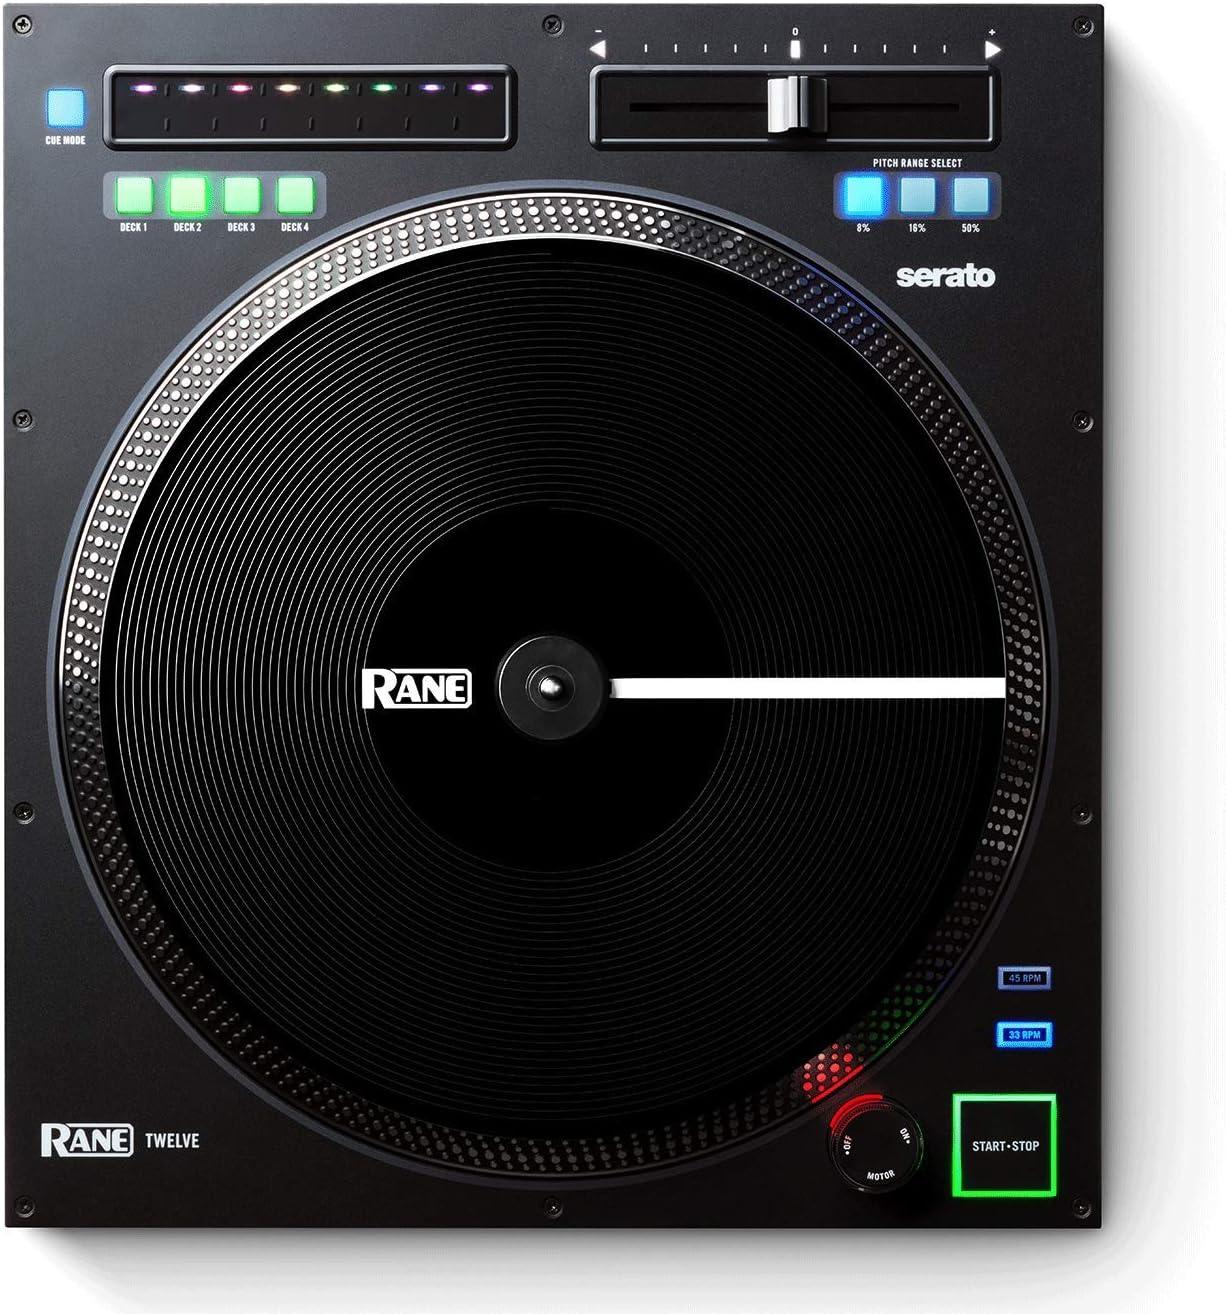 Amazon.com: RANE Doce DJ sistema de control: Musical Instruments